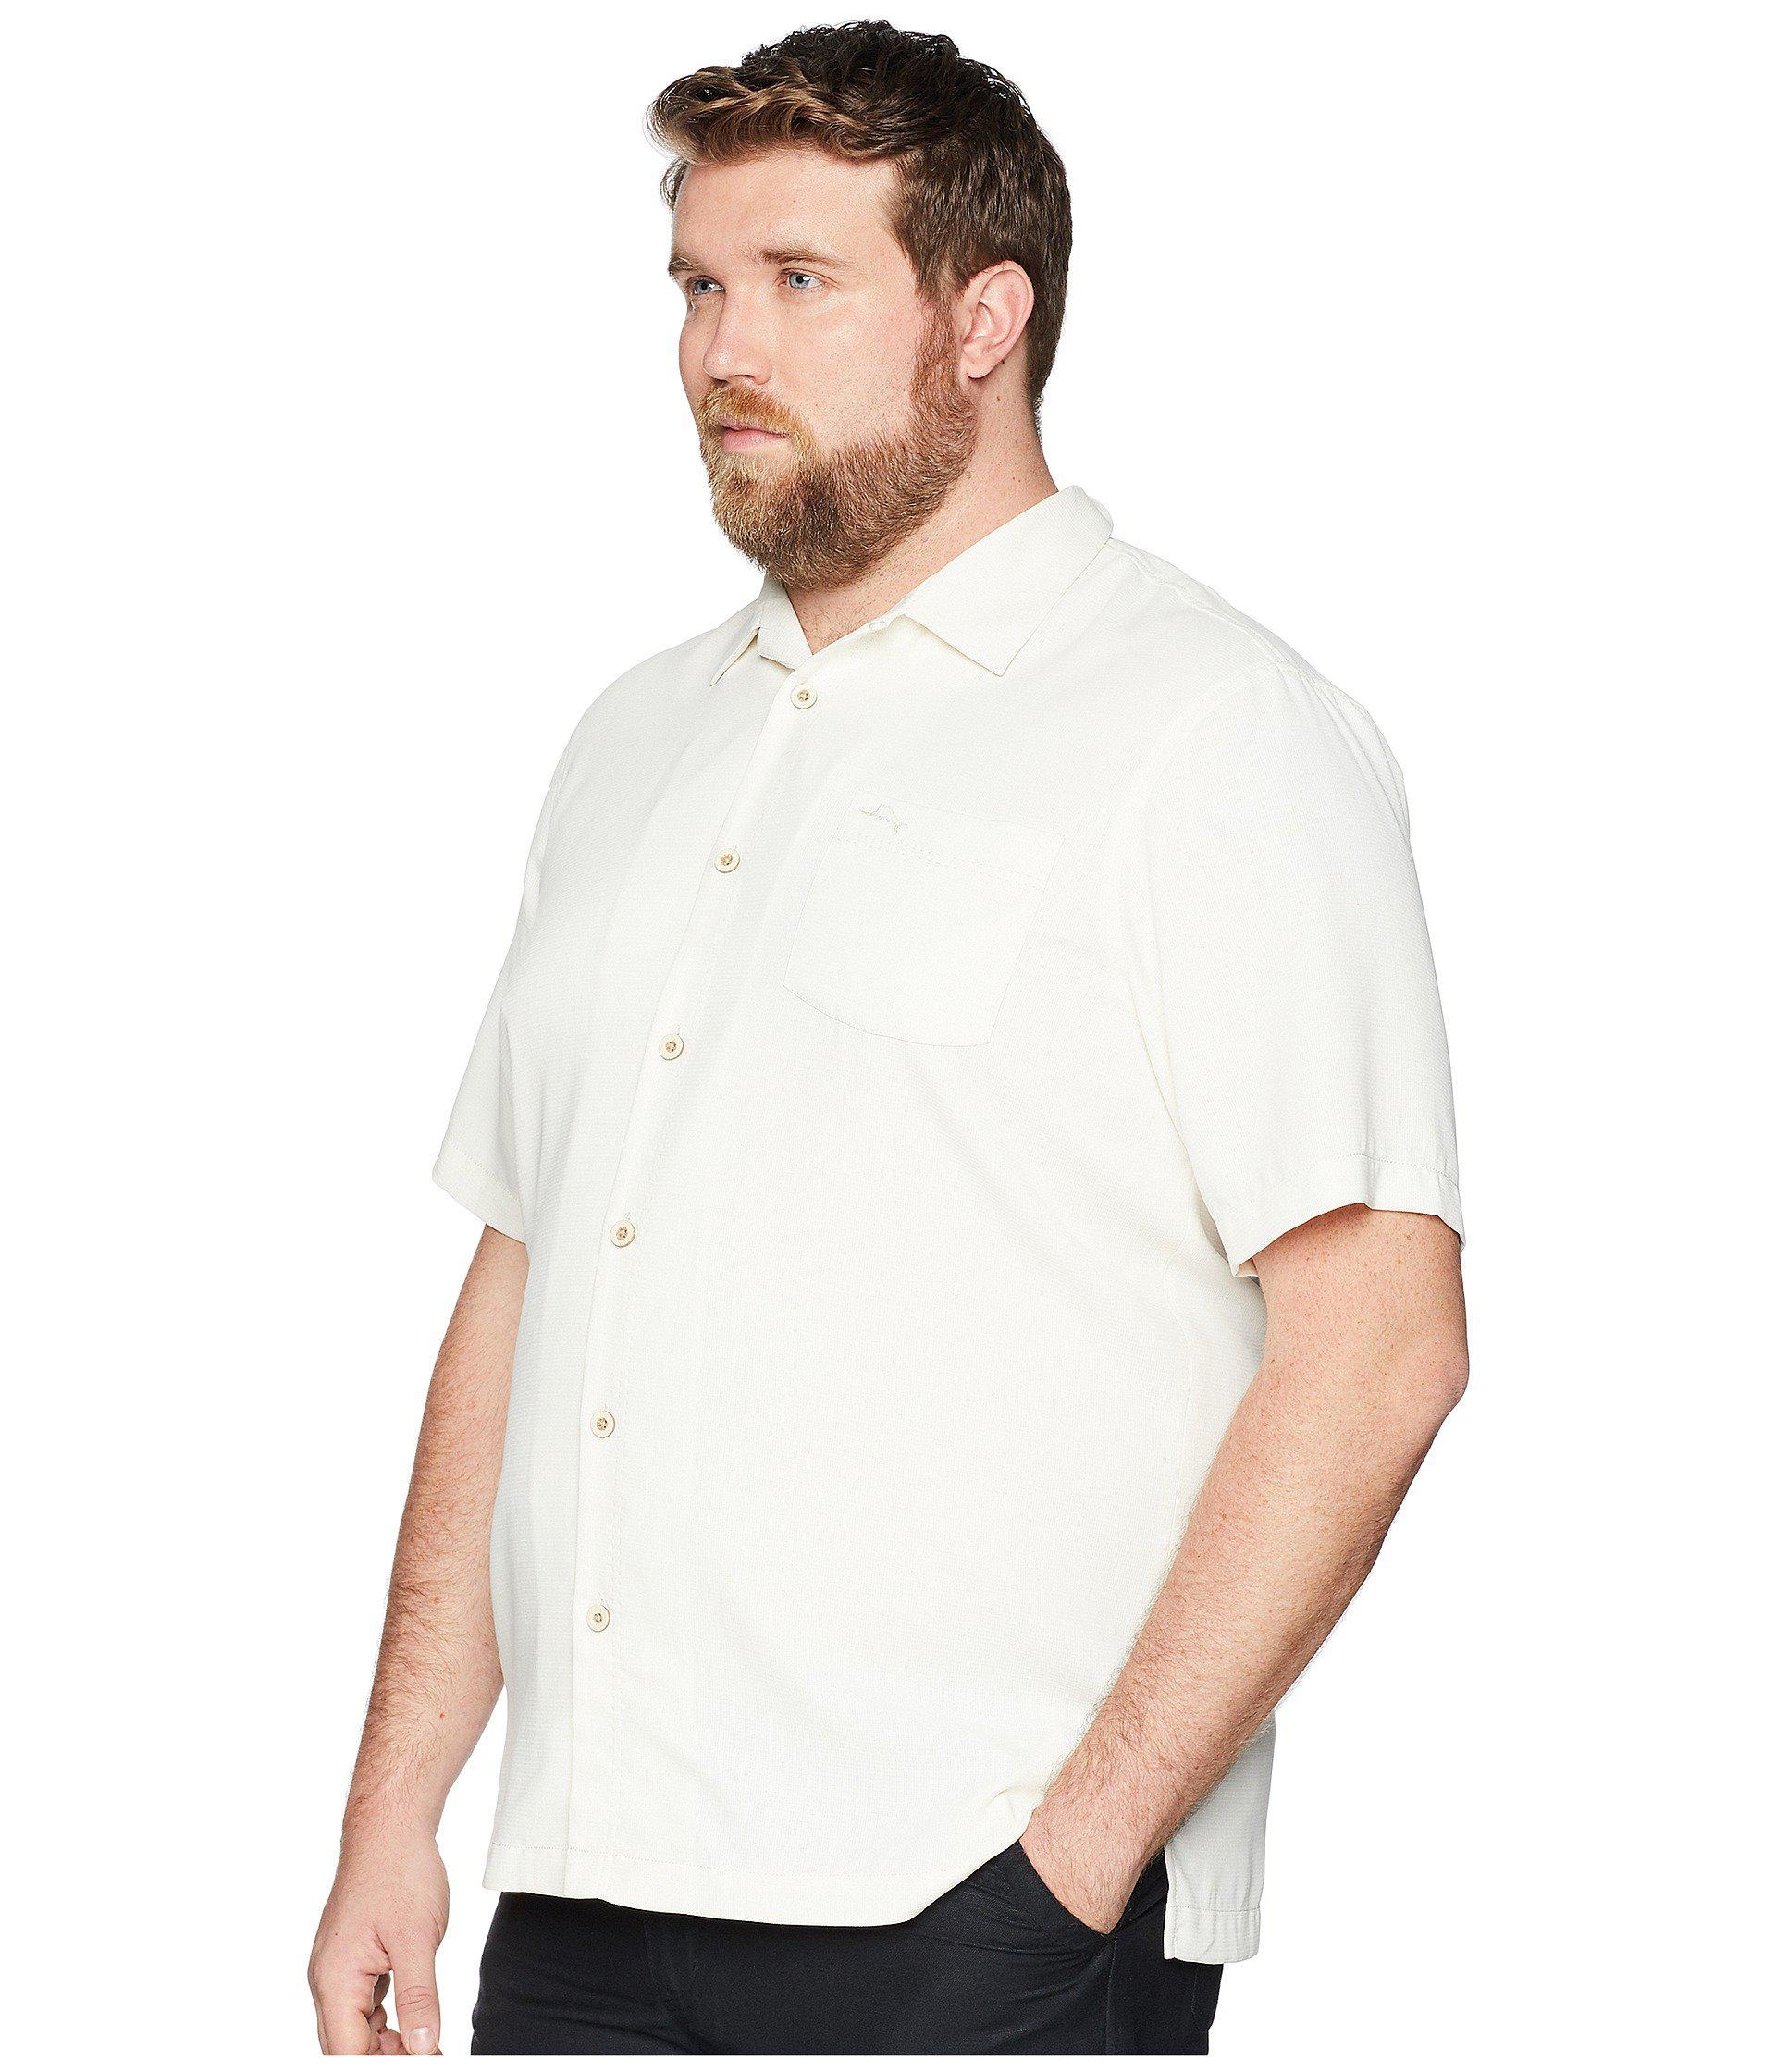 298cc2b3480fa Dress Shirts For Short Stocky Guys - DREAMWORKS